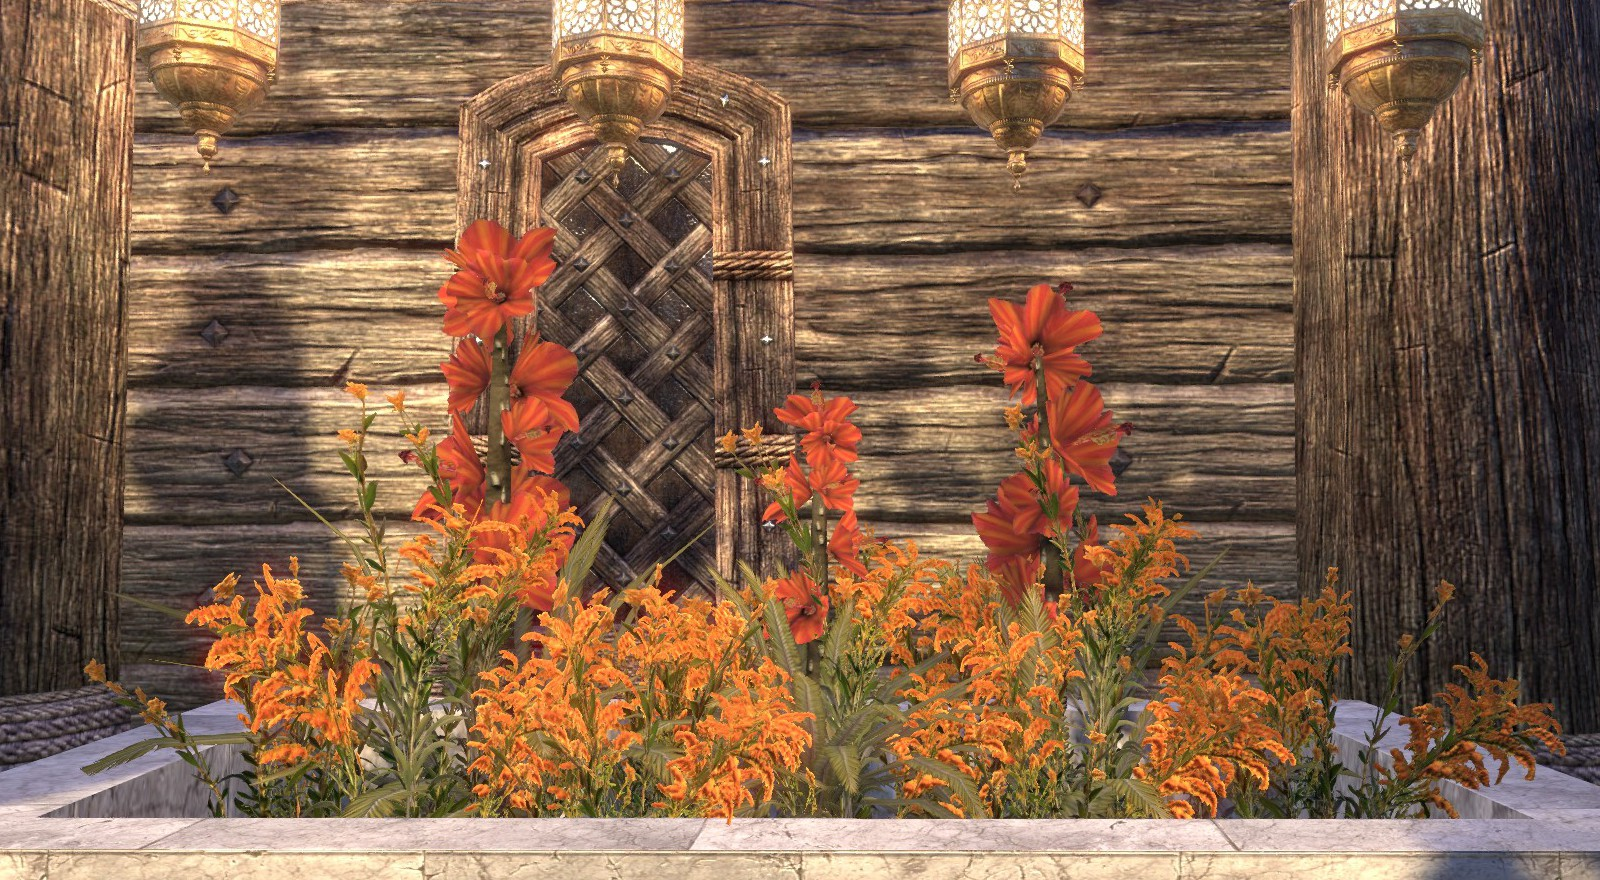 Flowers Hibiscus Goldenrod